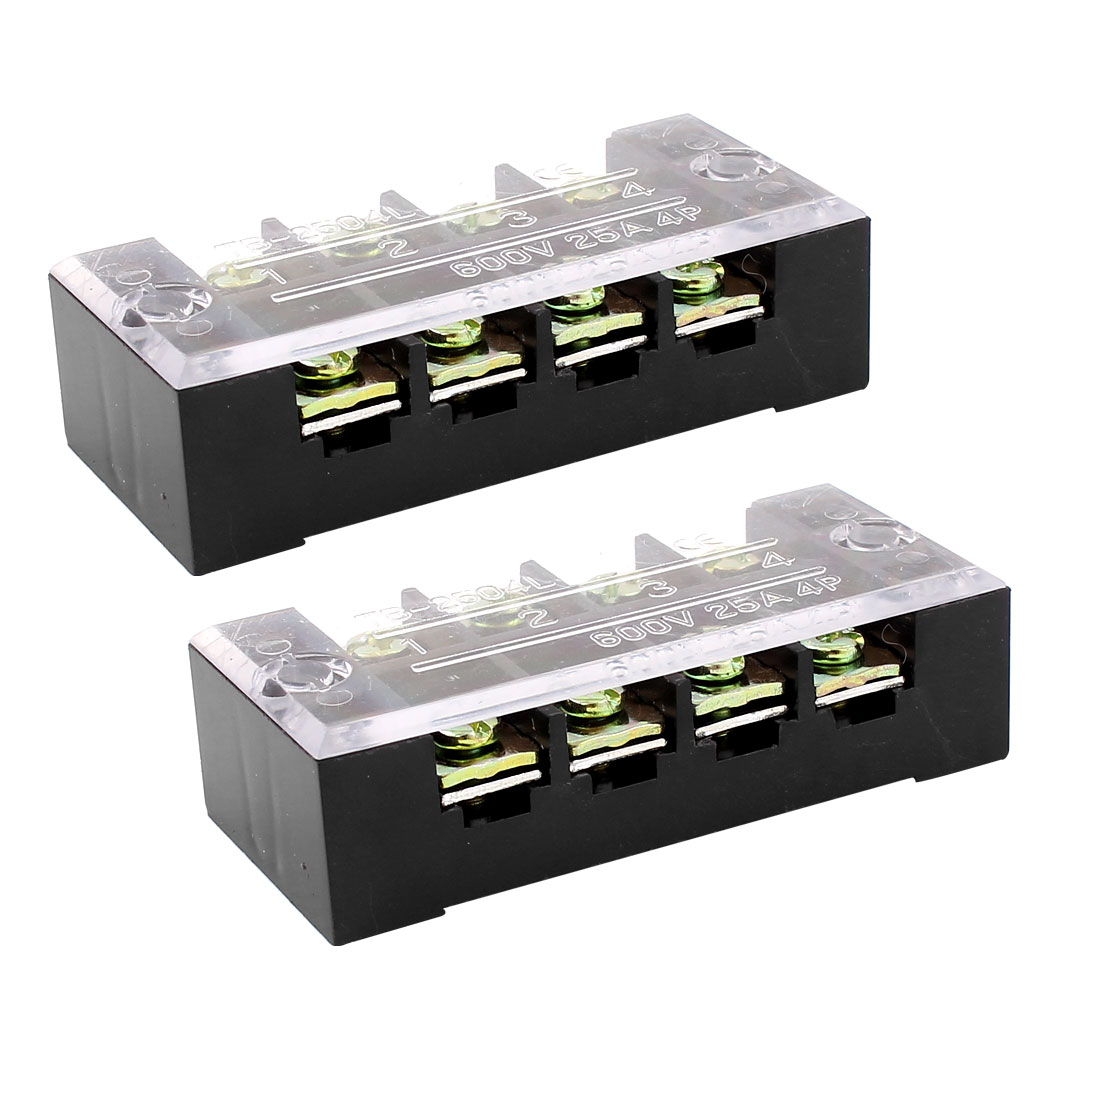 2pcs 600V 25A 4 Position Dual Row Barrier Terminal Block Strip w Cover